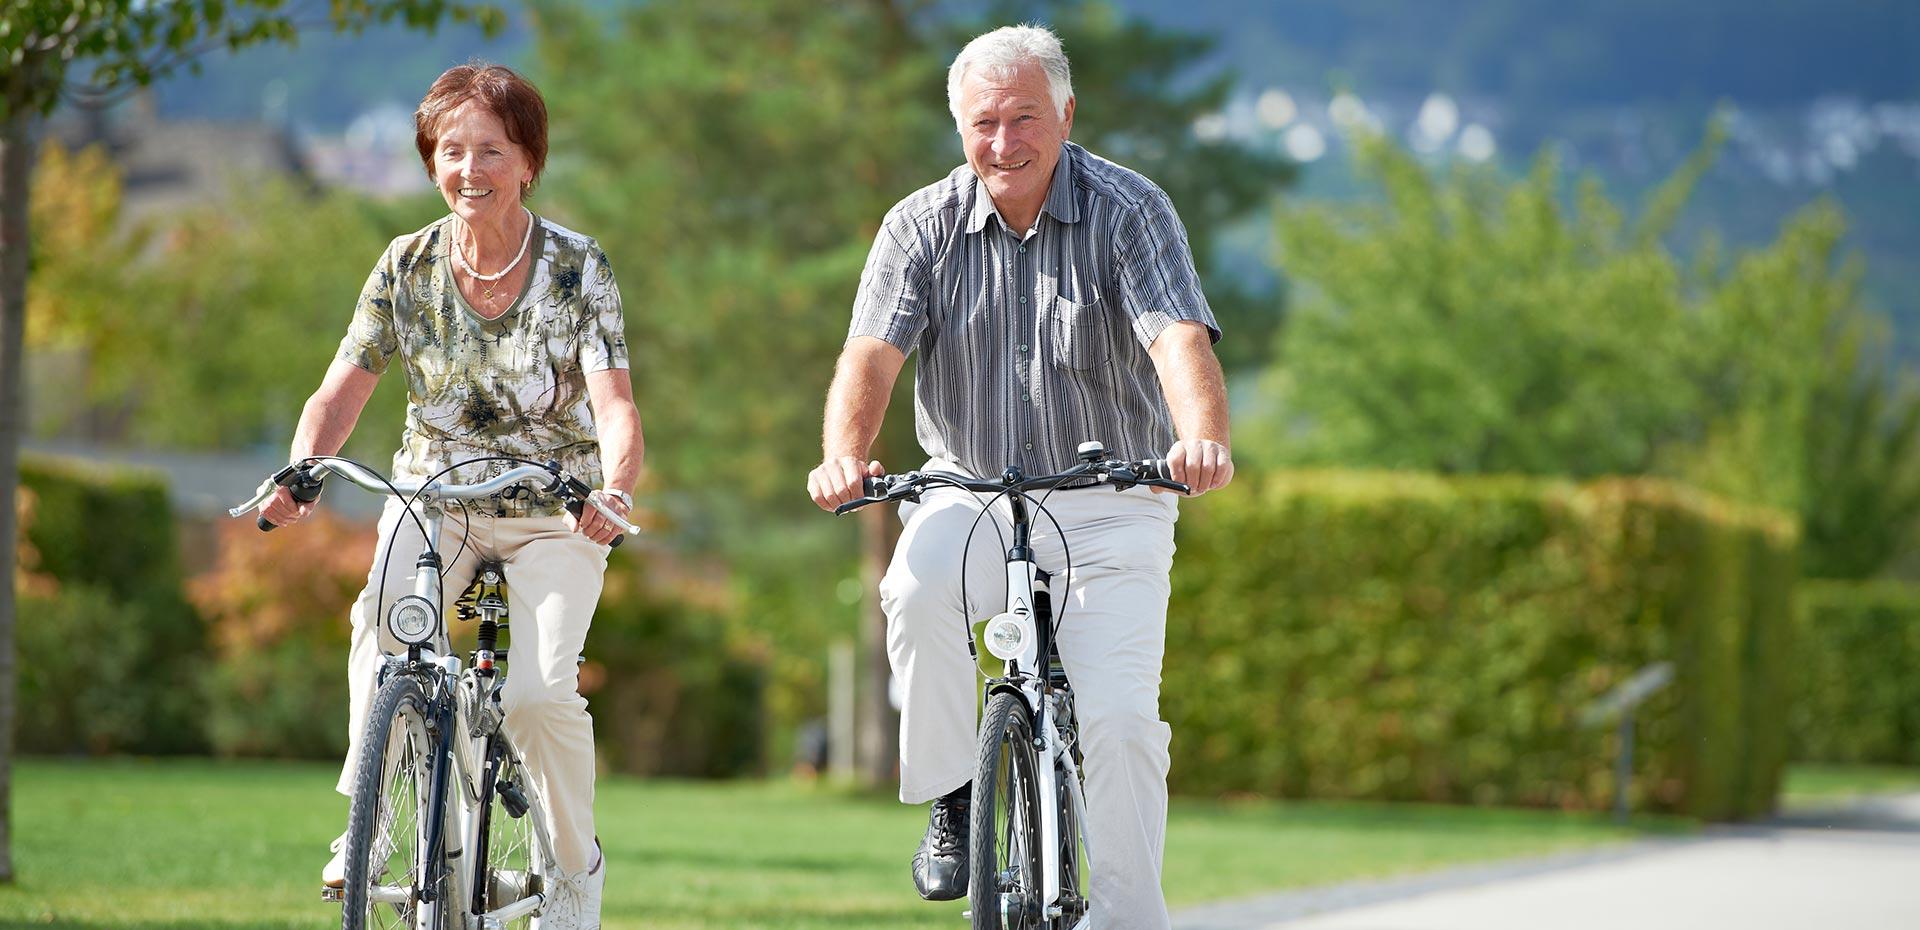 Selbständige Rentner